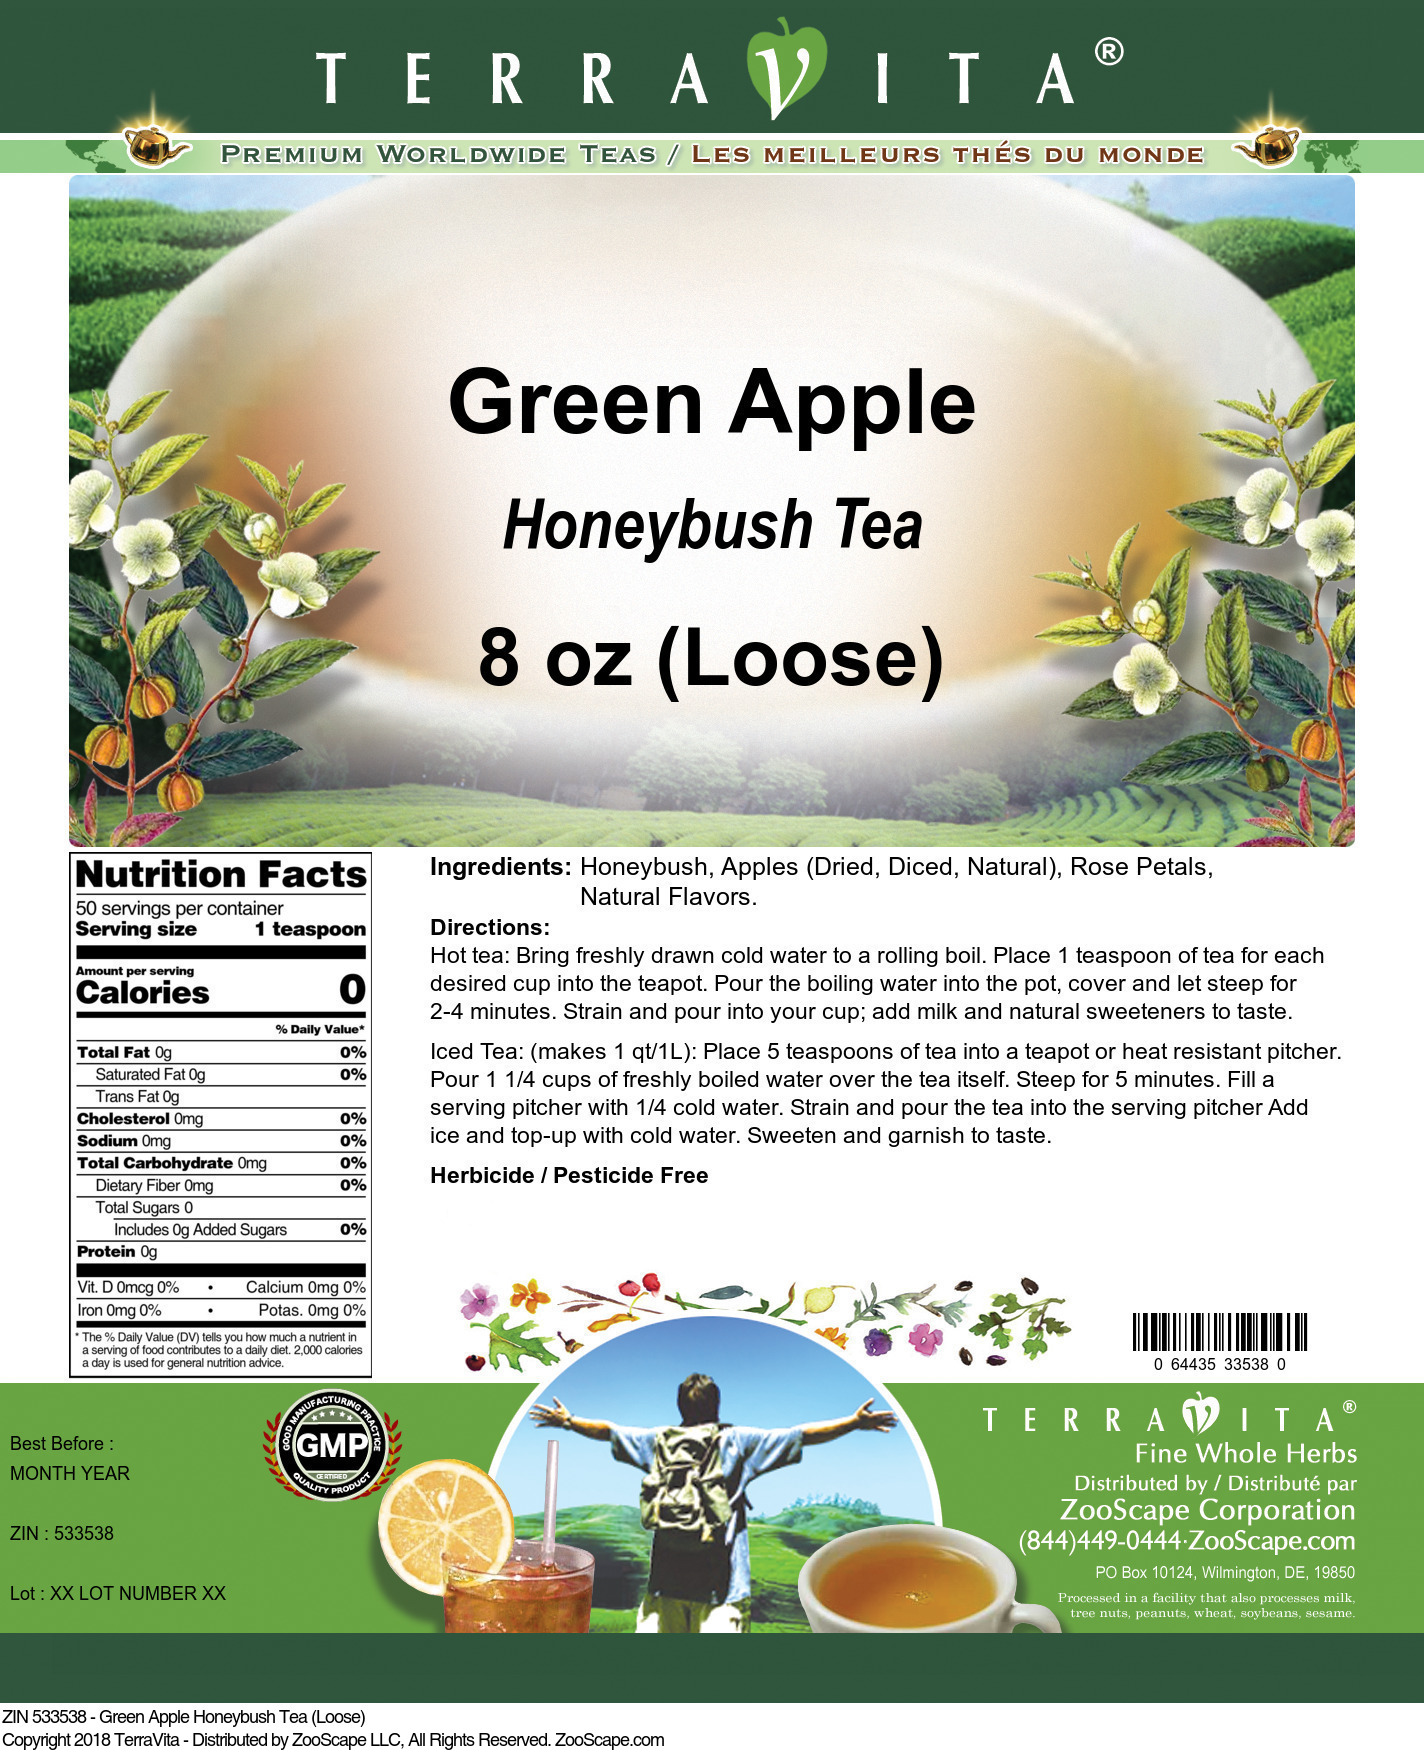 Green Apple Honeybush Tea